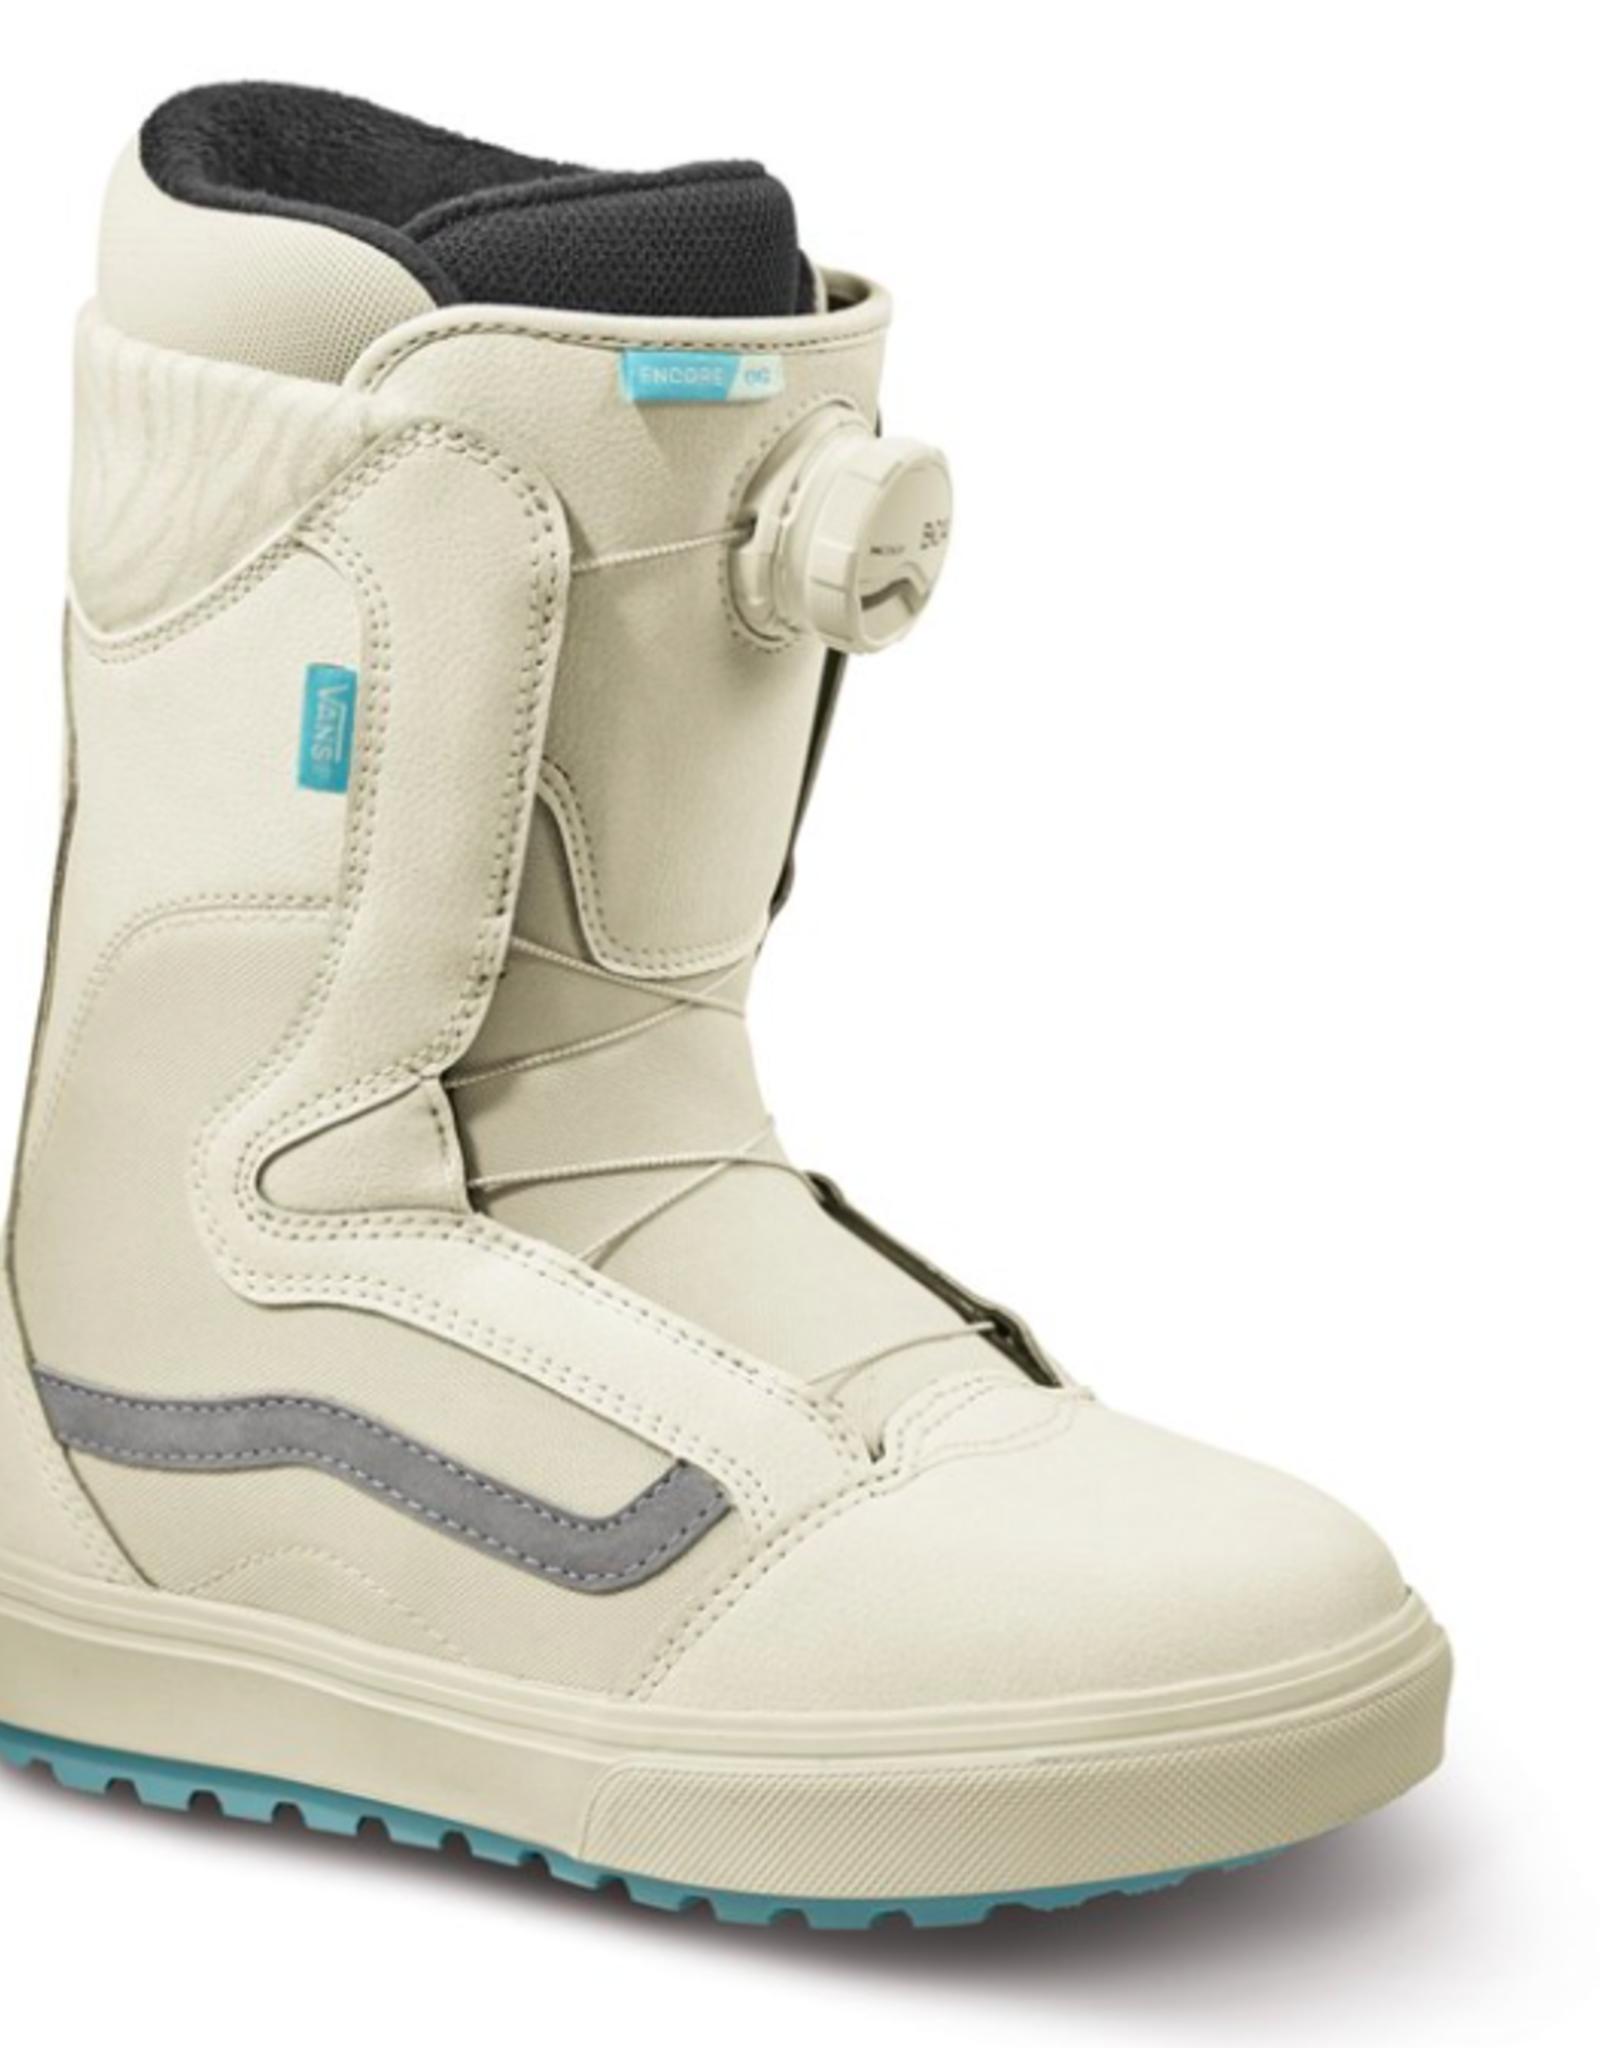 Vans Women's Encore OG Snowboard Boots 2022